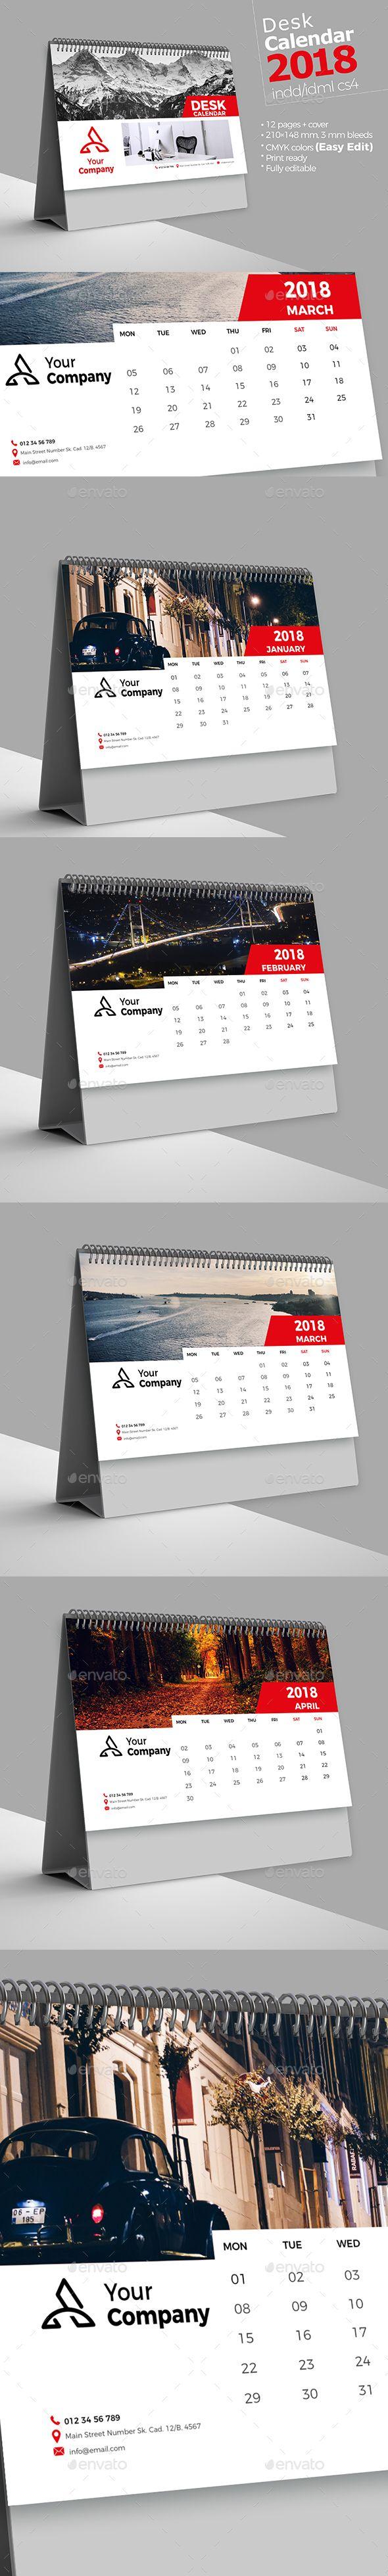 Desk Calendar 2018 Template InDesign INDD #design   Calendar ...